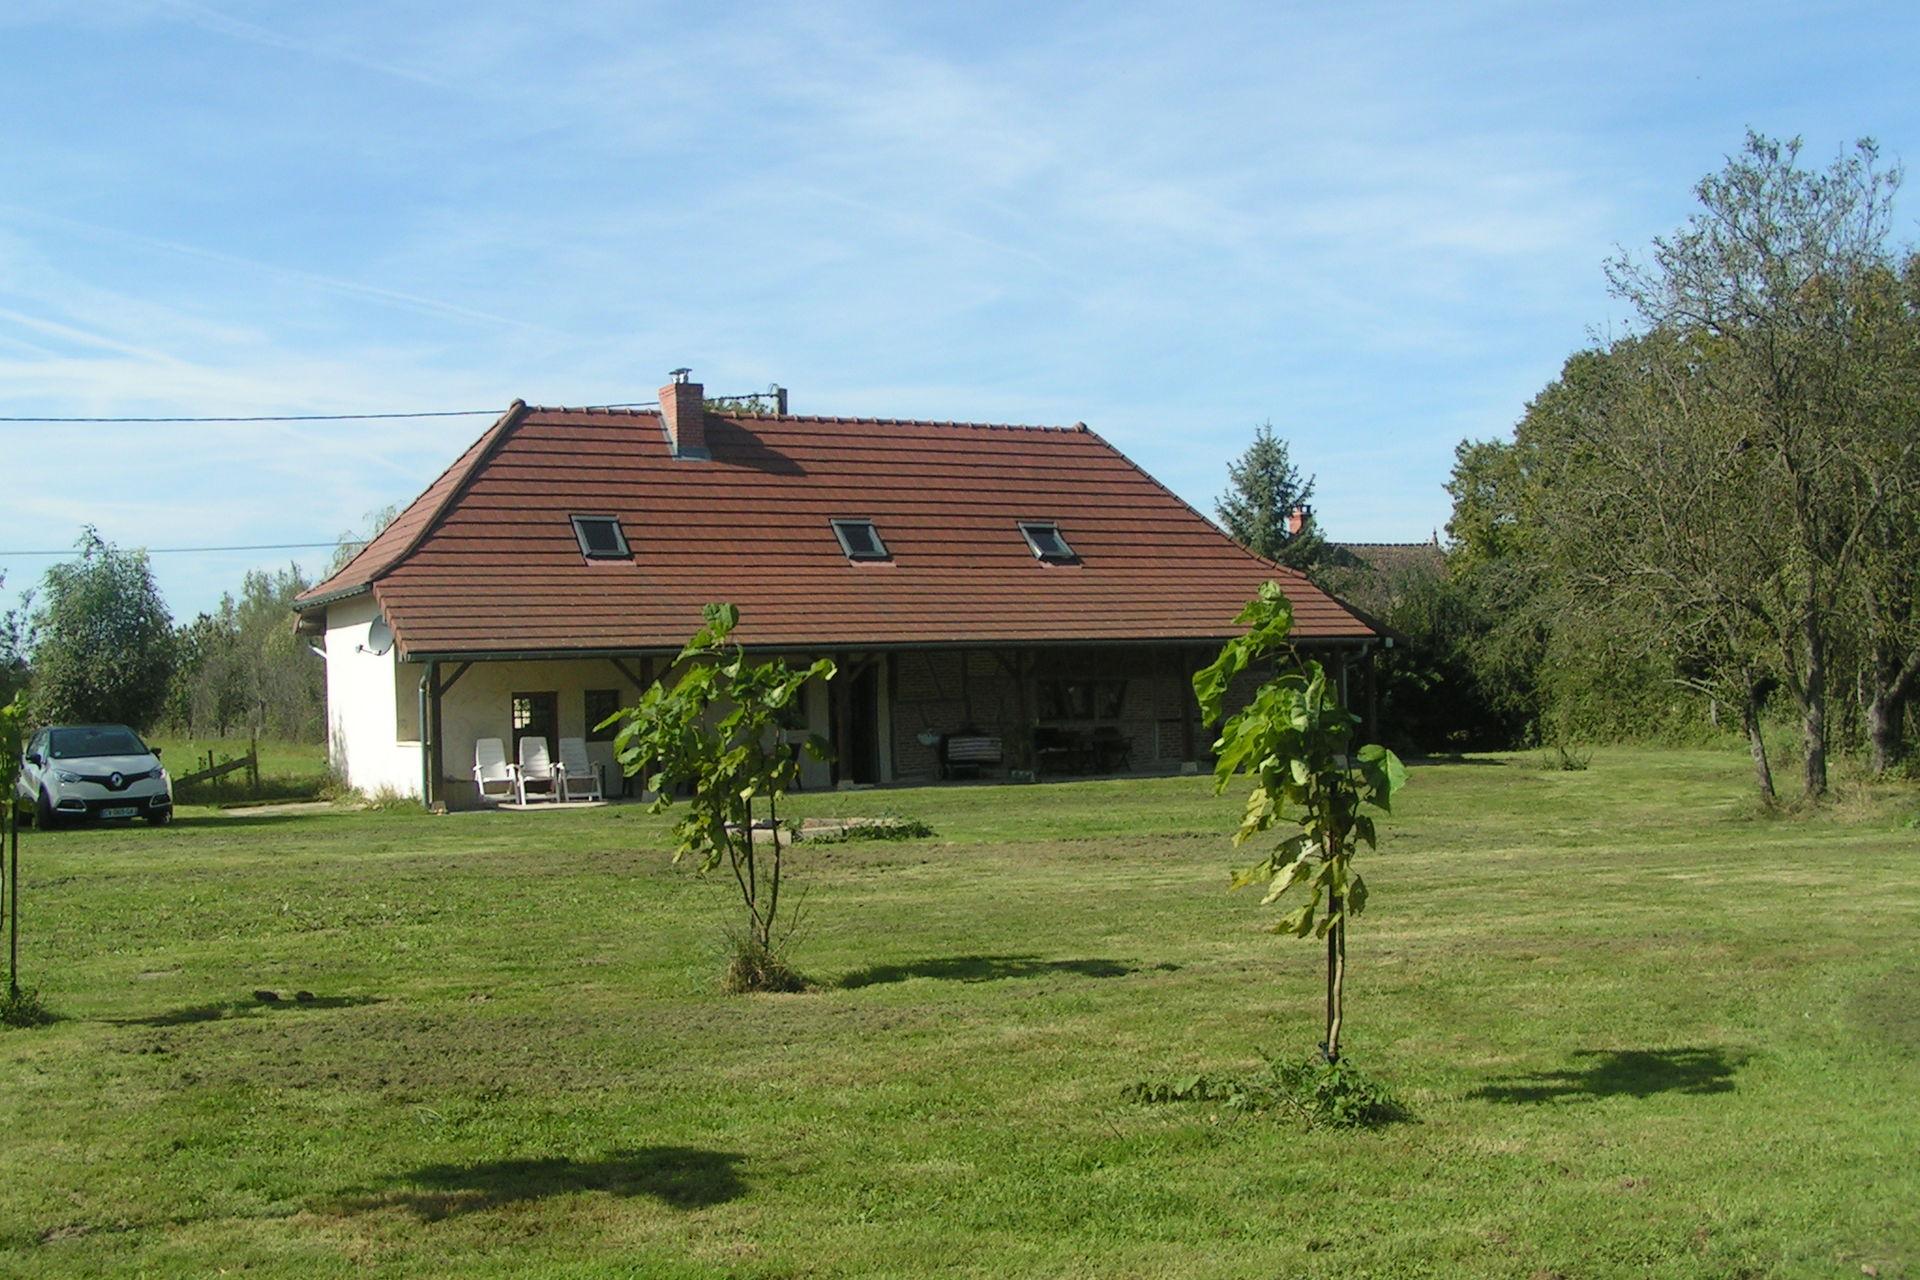 Bekijk vakantiehuis l ancienne ferme in sa ne et loire bourgogne - Stijl ligstoelen anciennes ...